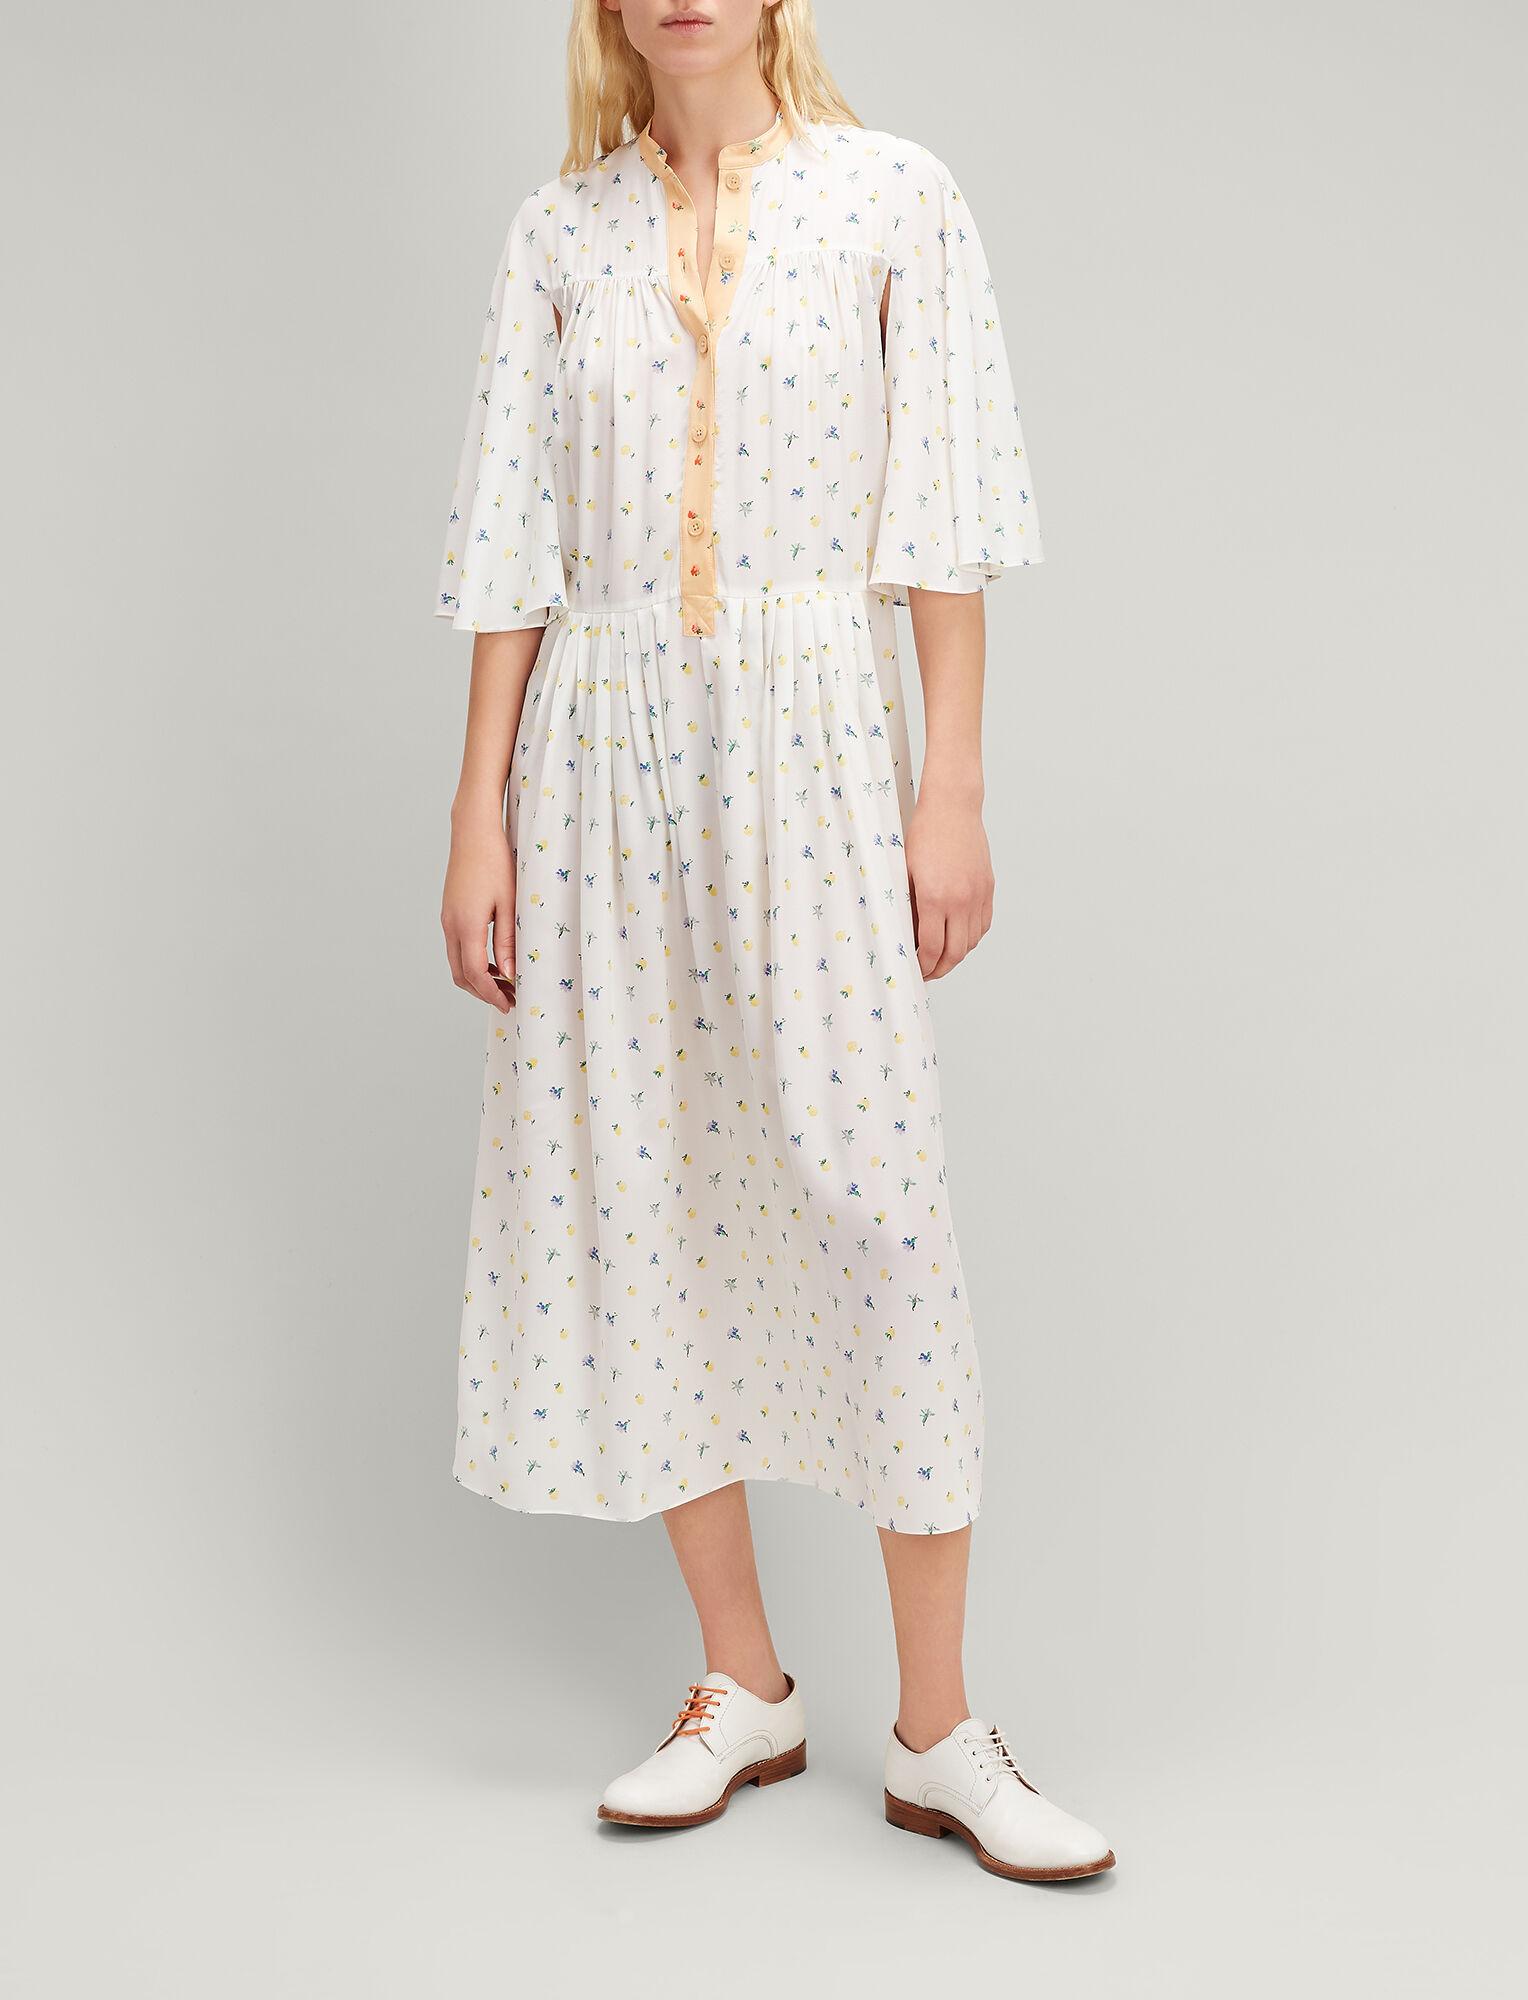 Morrisson floral-print silk dress Joseph Buy Cheap Latest Collections Zu1nvV4